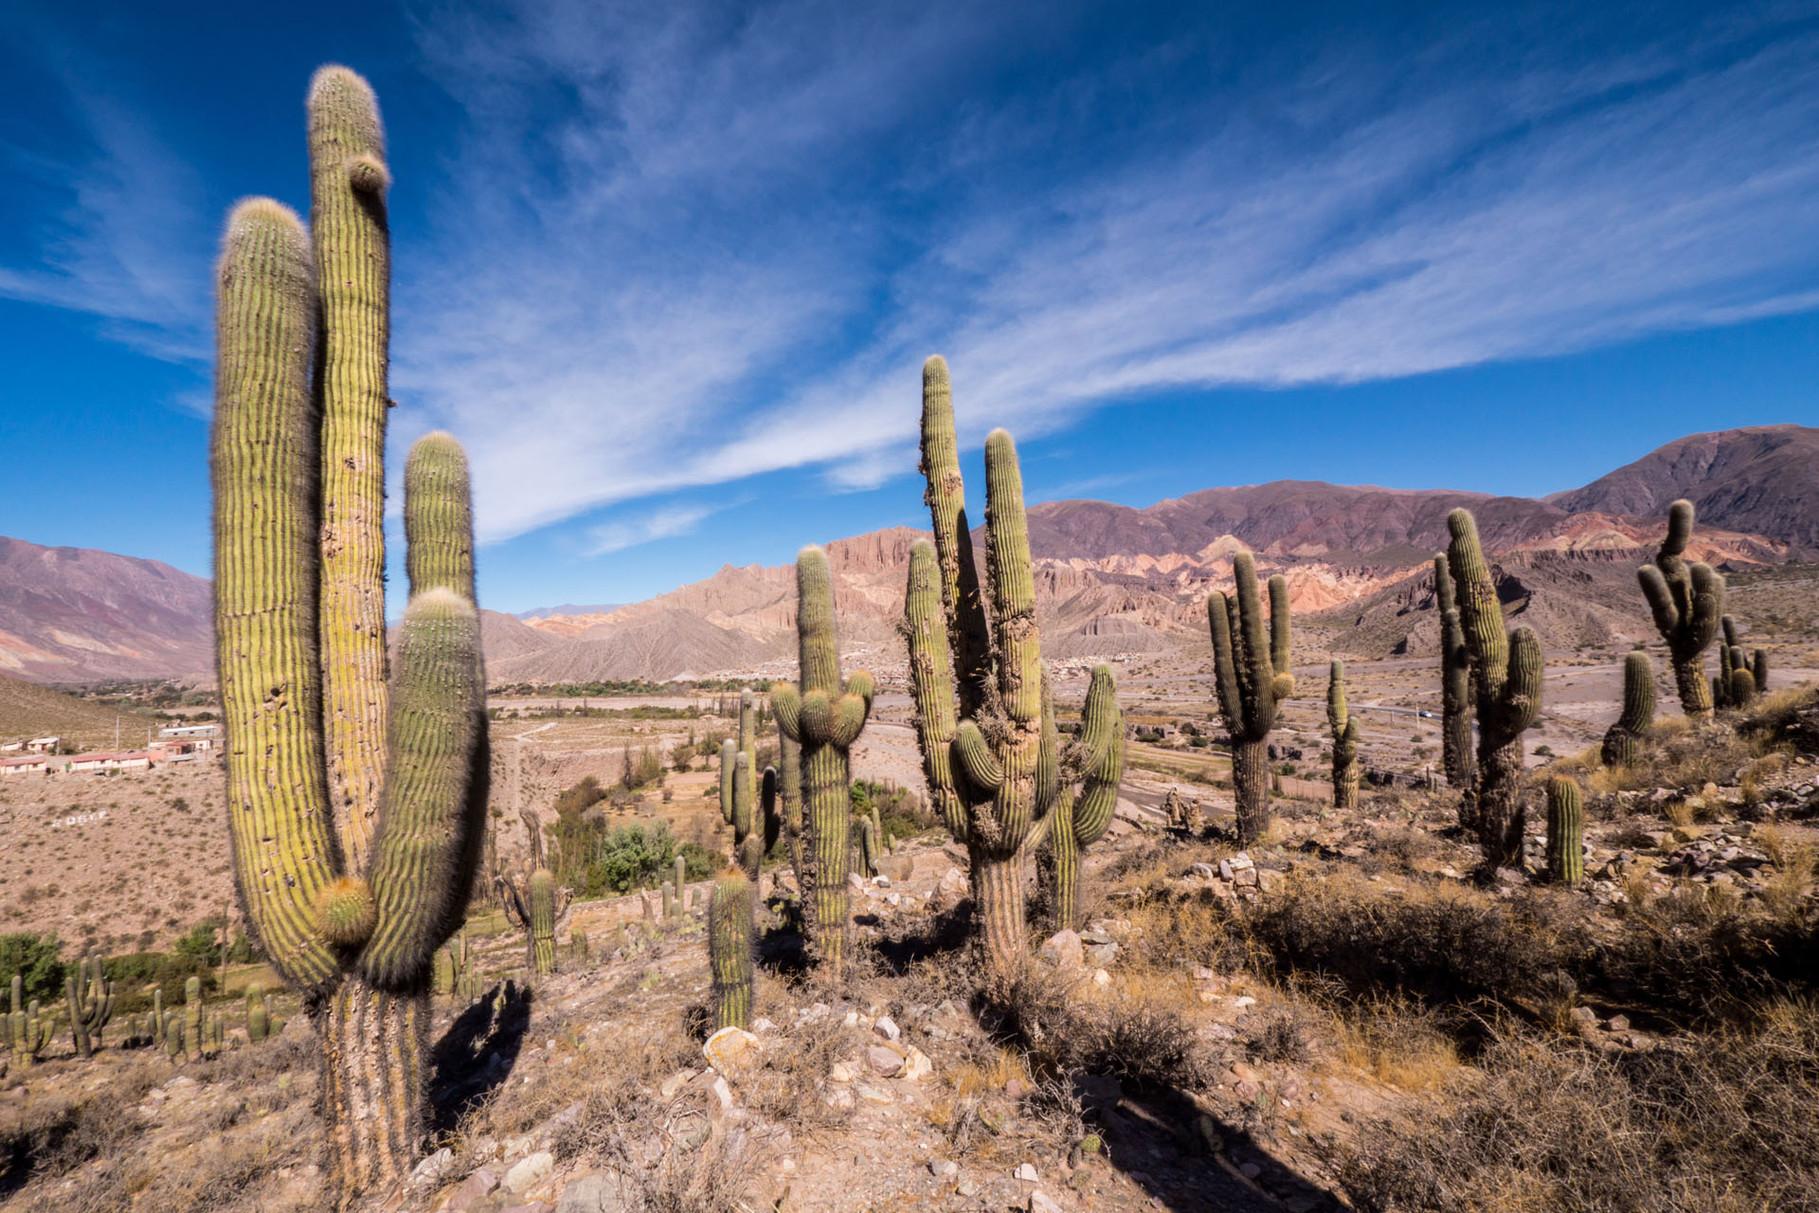 National park Los Cardones (cactus), near Cachi [Argentina, 2014]